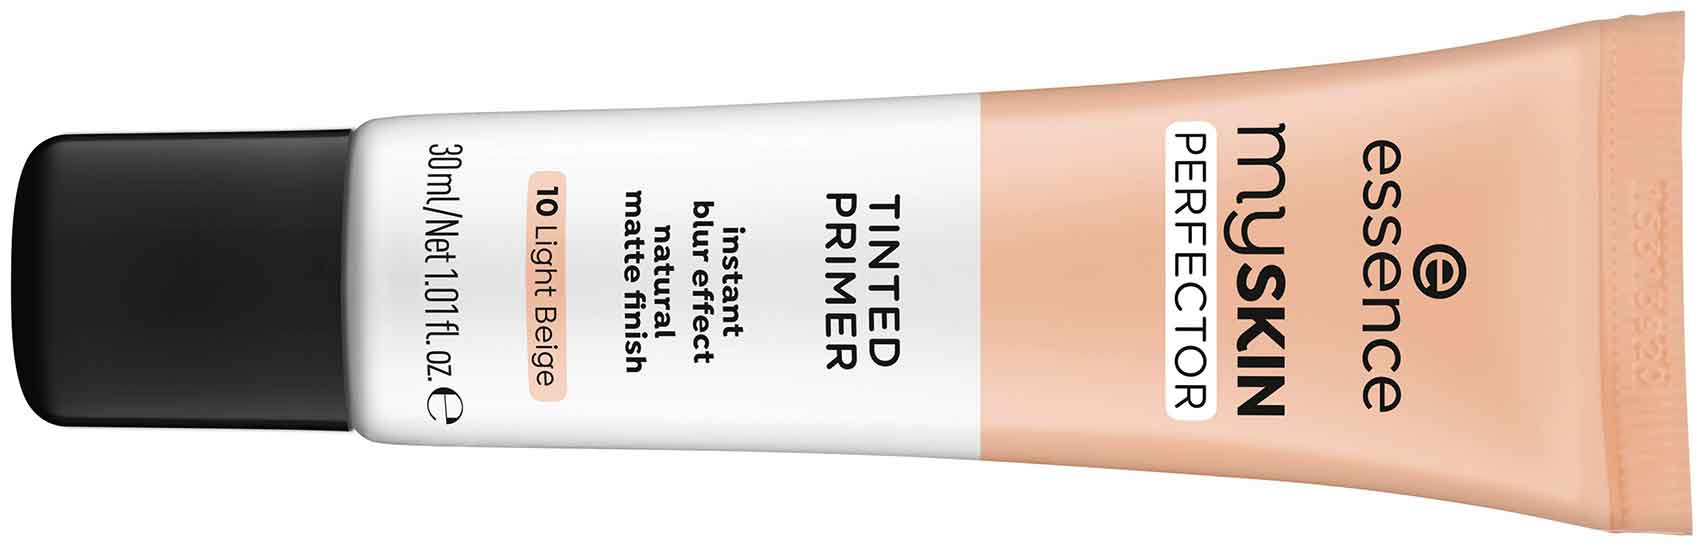 essence-פרמייר-PRIMER-מגזין-אופנה-essence